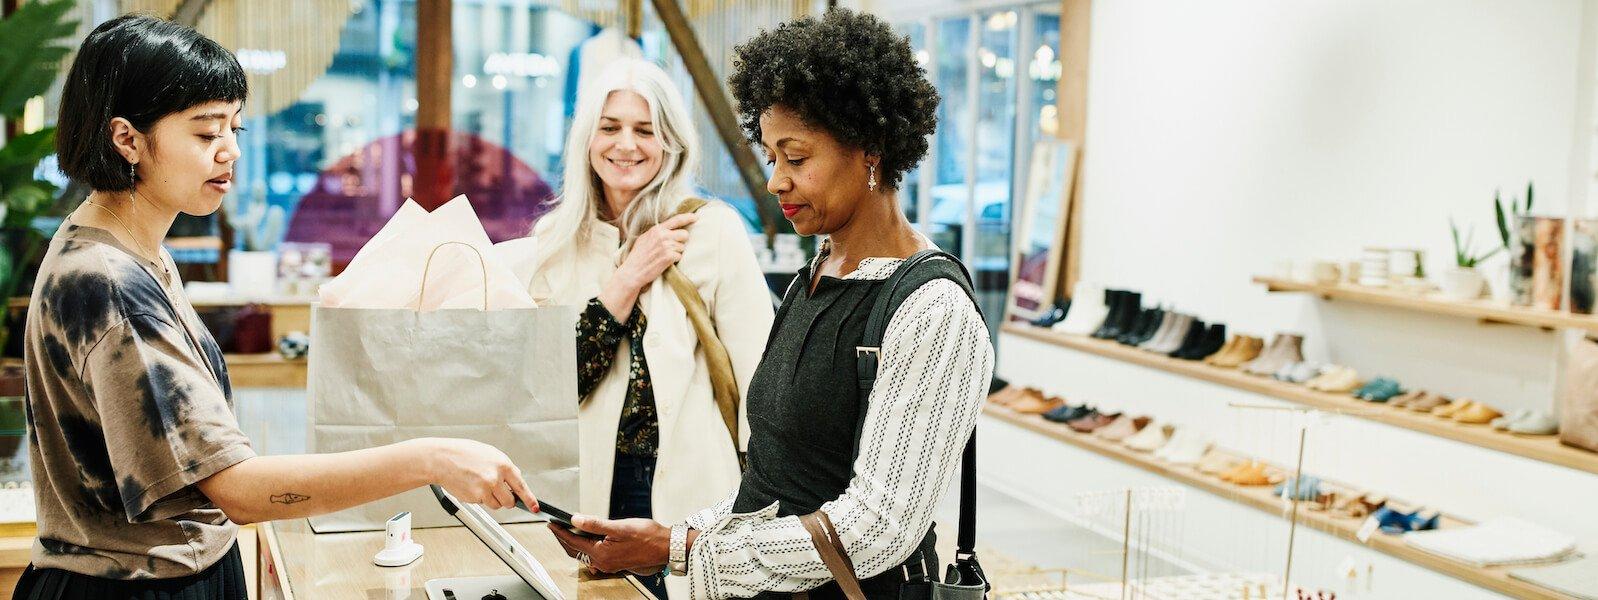 global retail rpa landmark group uipath